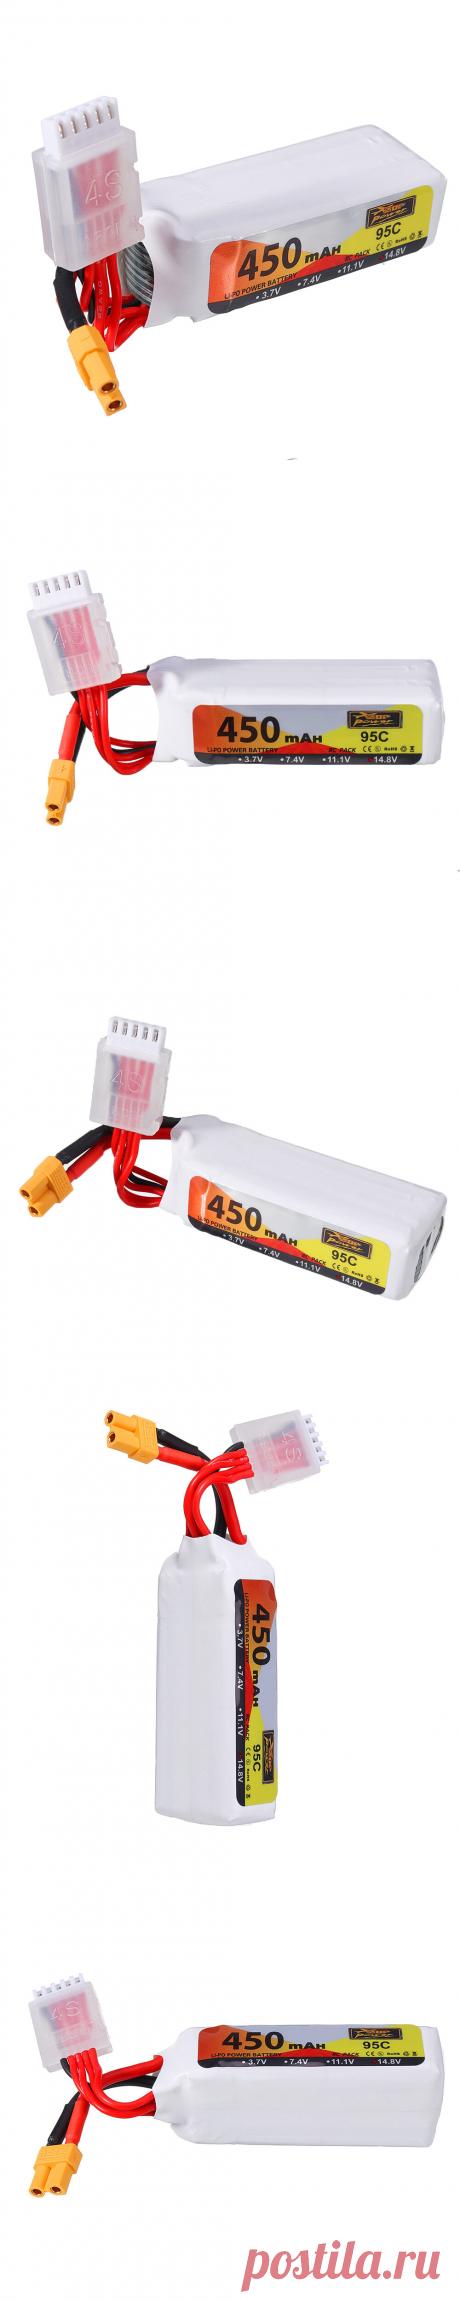 zop power 14.8v 450mah 95c 4s lipo battery xt30 plug for 90-150 sizes multirotor fpv drone Sale - Banggood.com